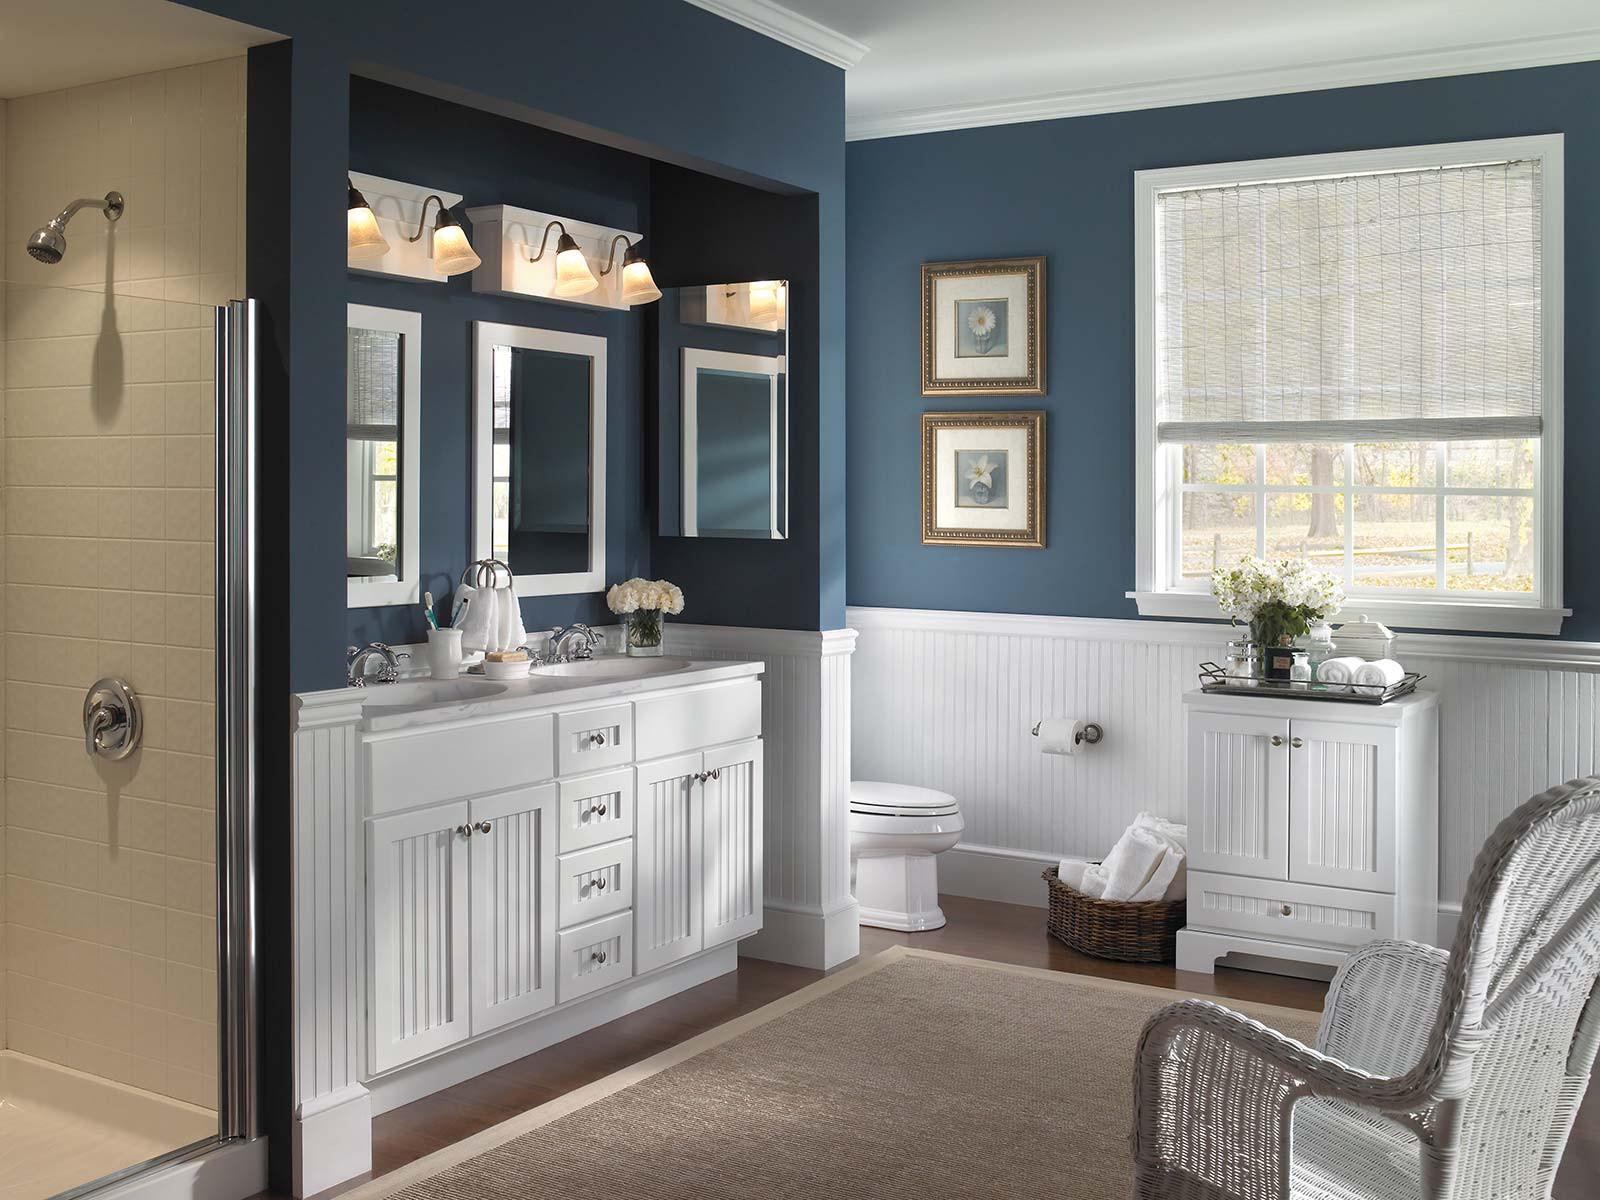 Cabinets To Go Bathroom Vanity  Bath Vanities and Bath Cabinetry Bertch Cabinet